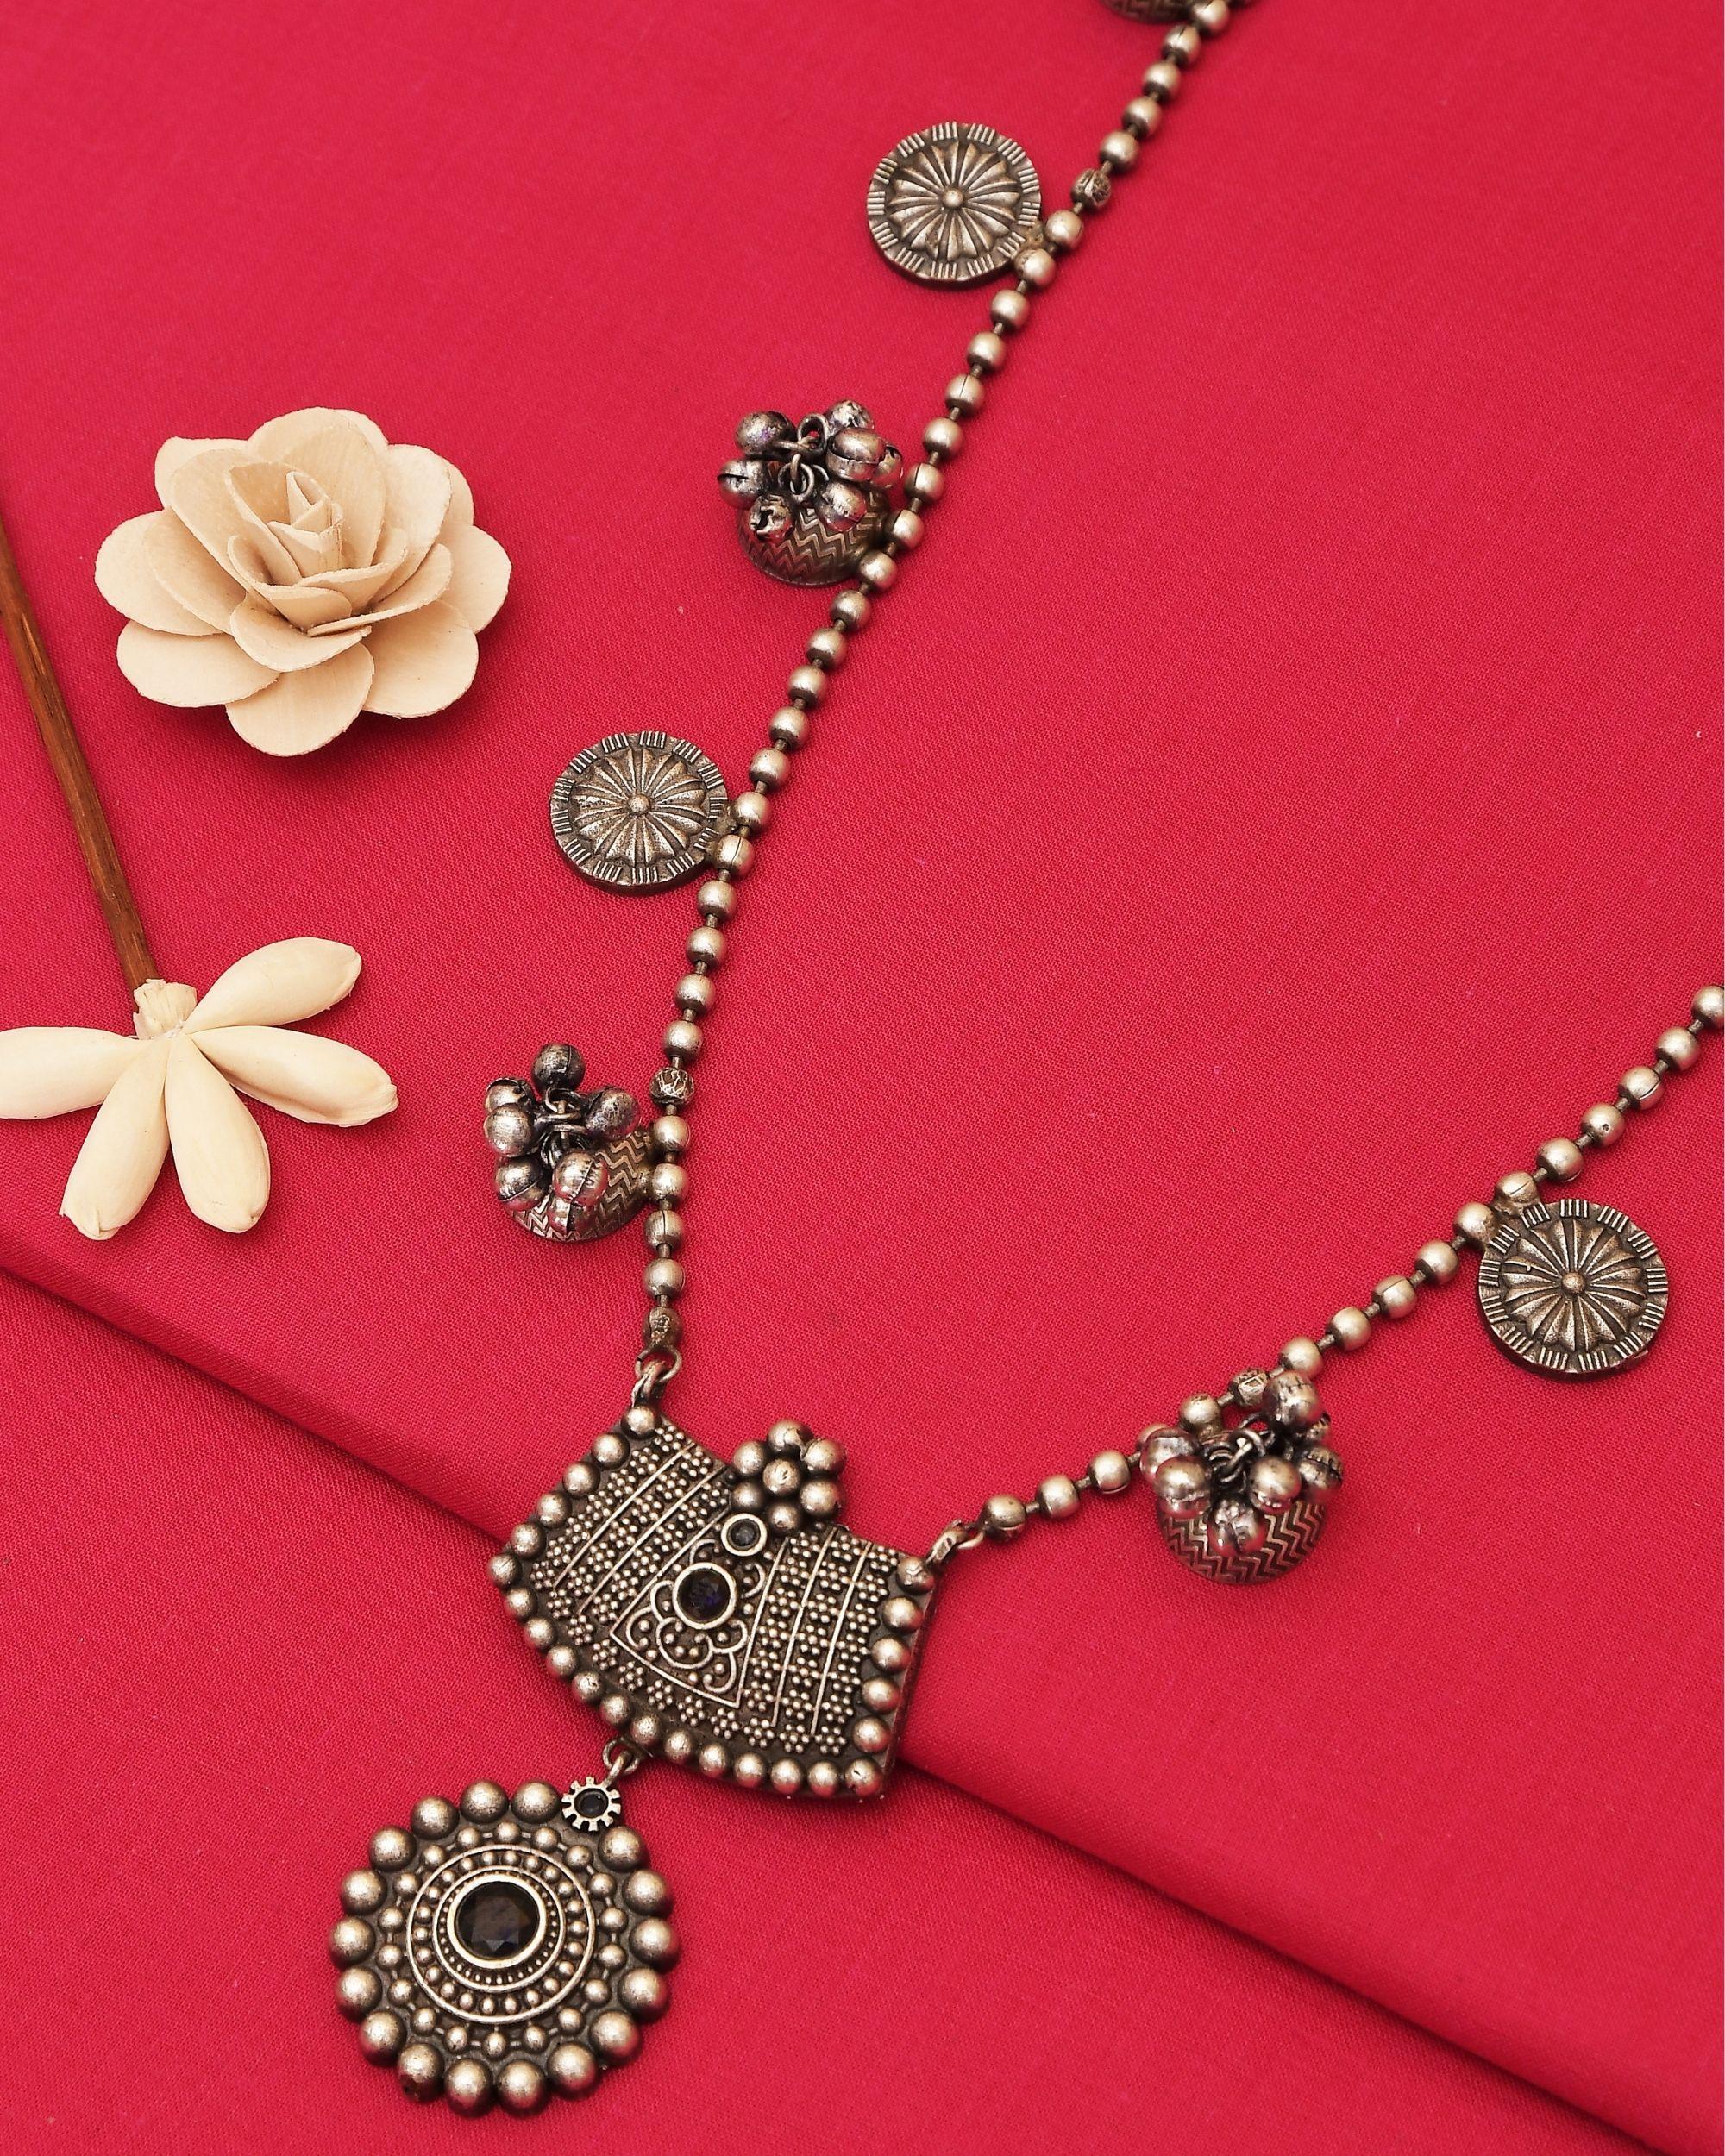 Floral engraved beaded neckpiece